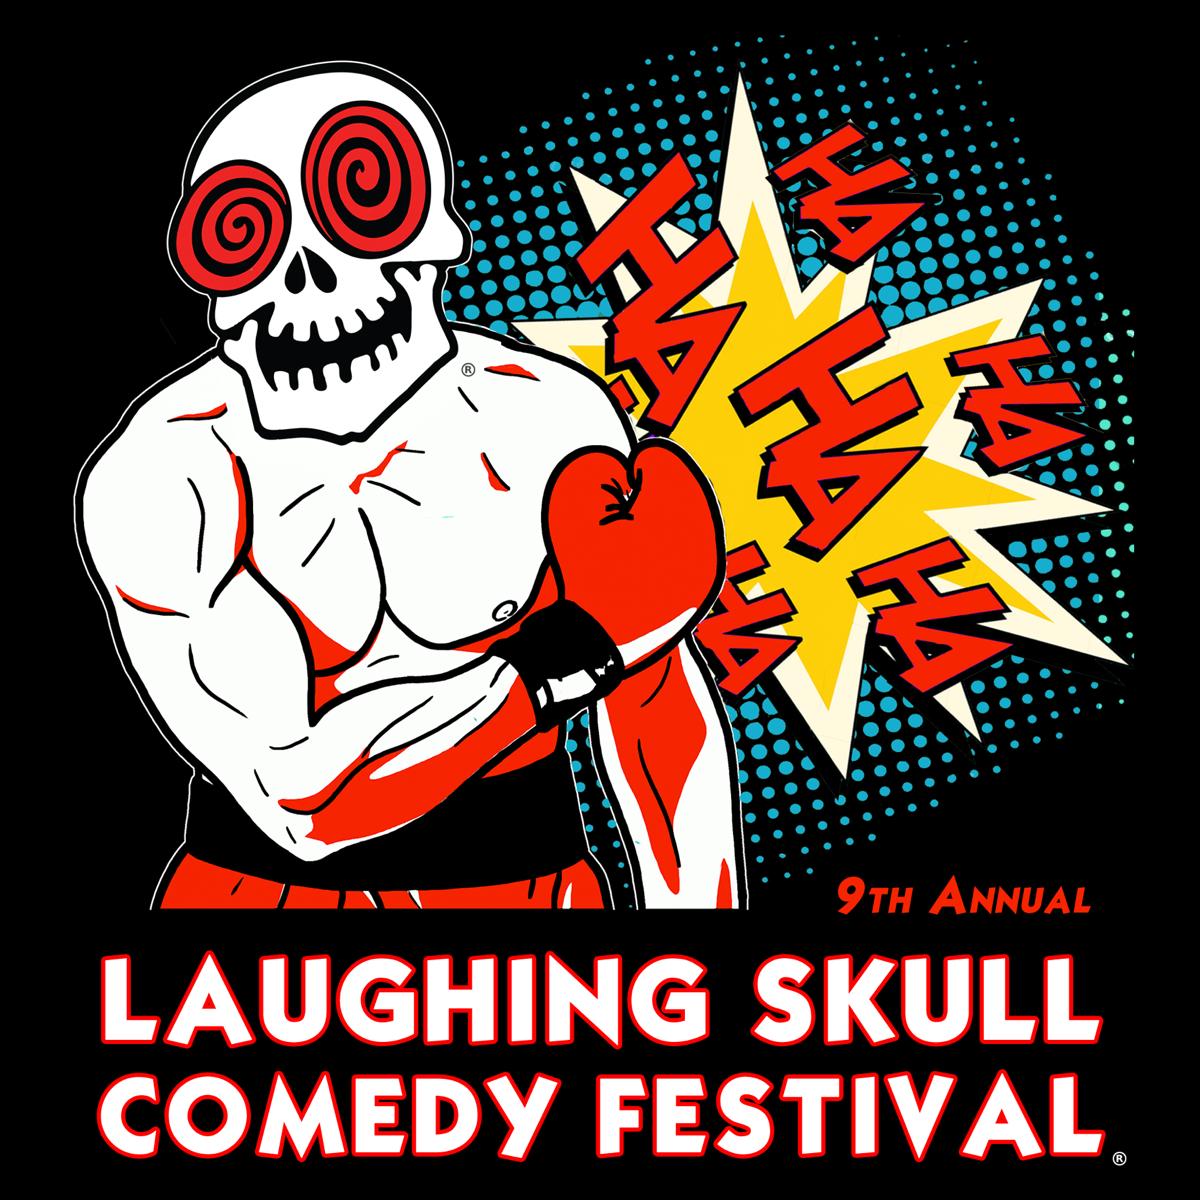 The 9th Annual Laughing Skull Comedy Festival — Saturday 8pm Show at Red Light Café — April 28, 2018 — Red Light Café, Atlanta, GA